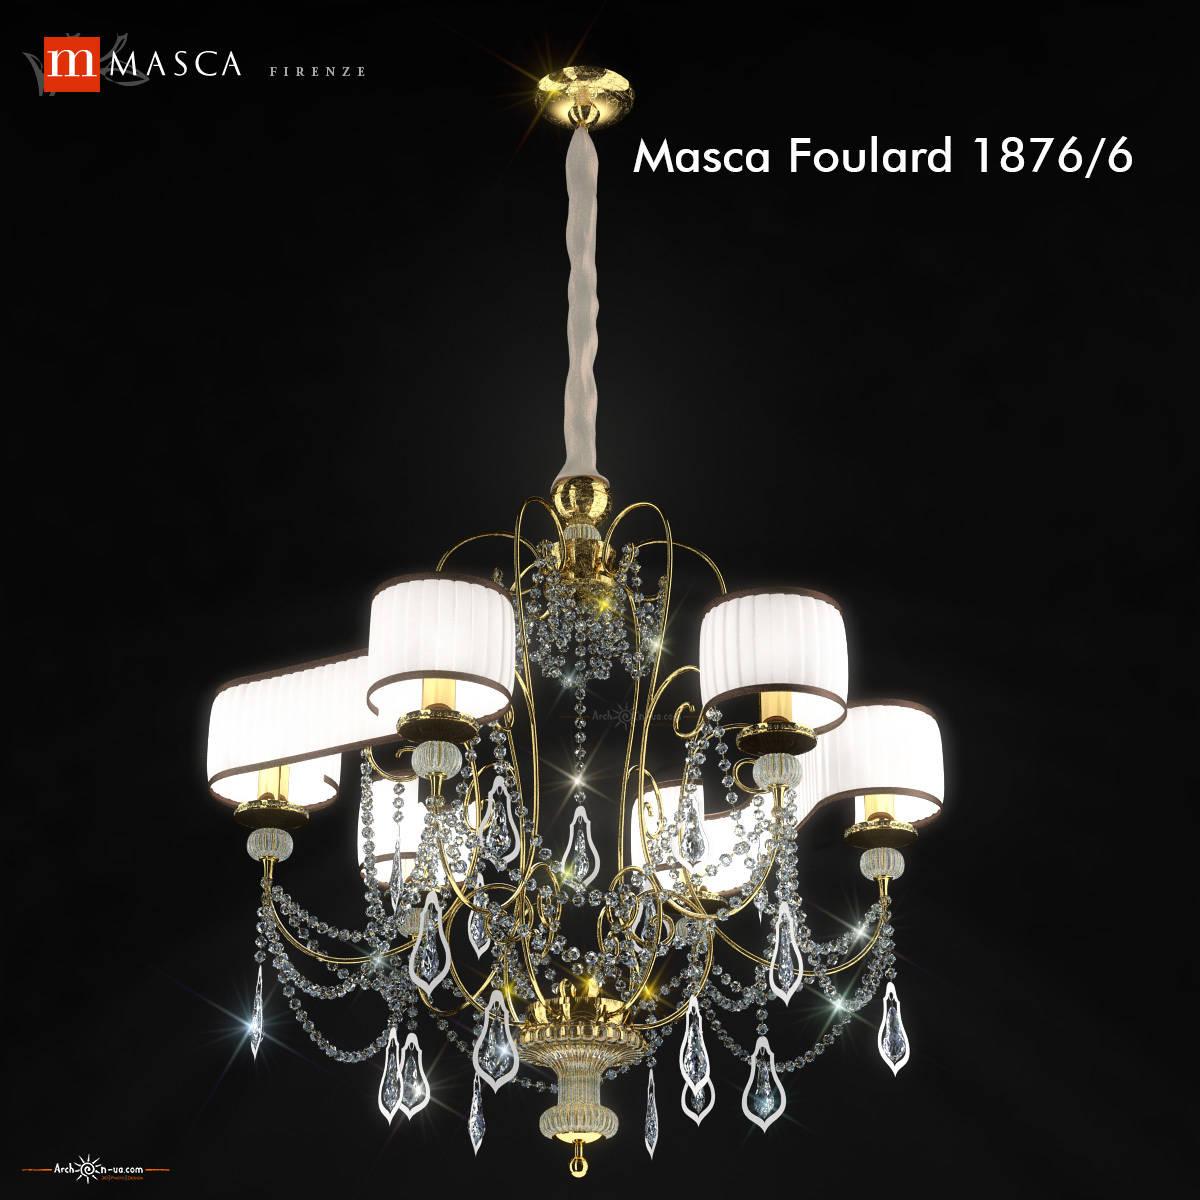 3d model of candel Masca Foulard 1876 6